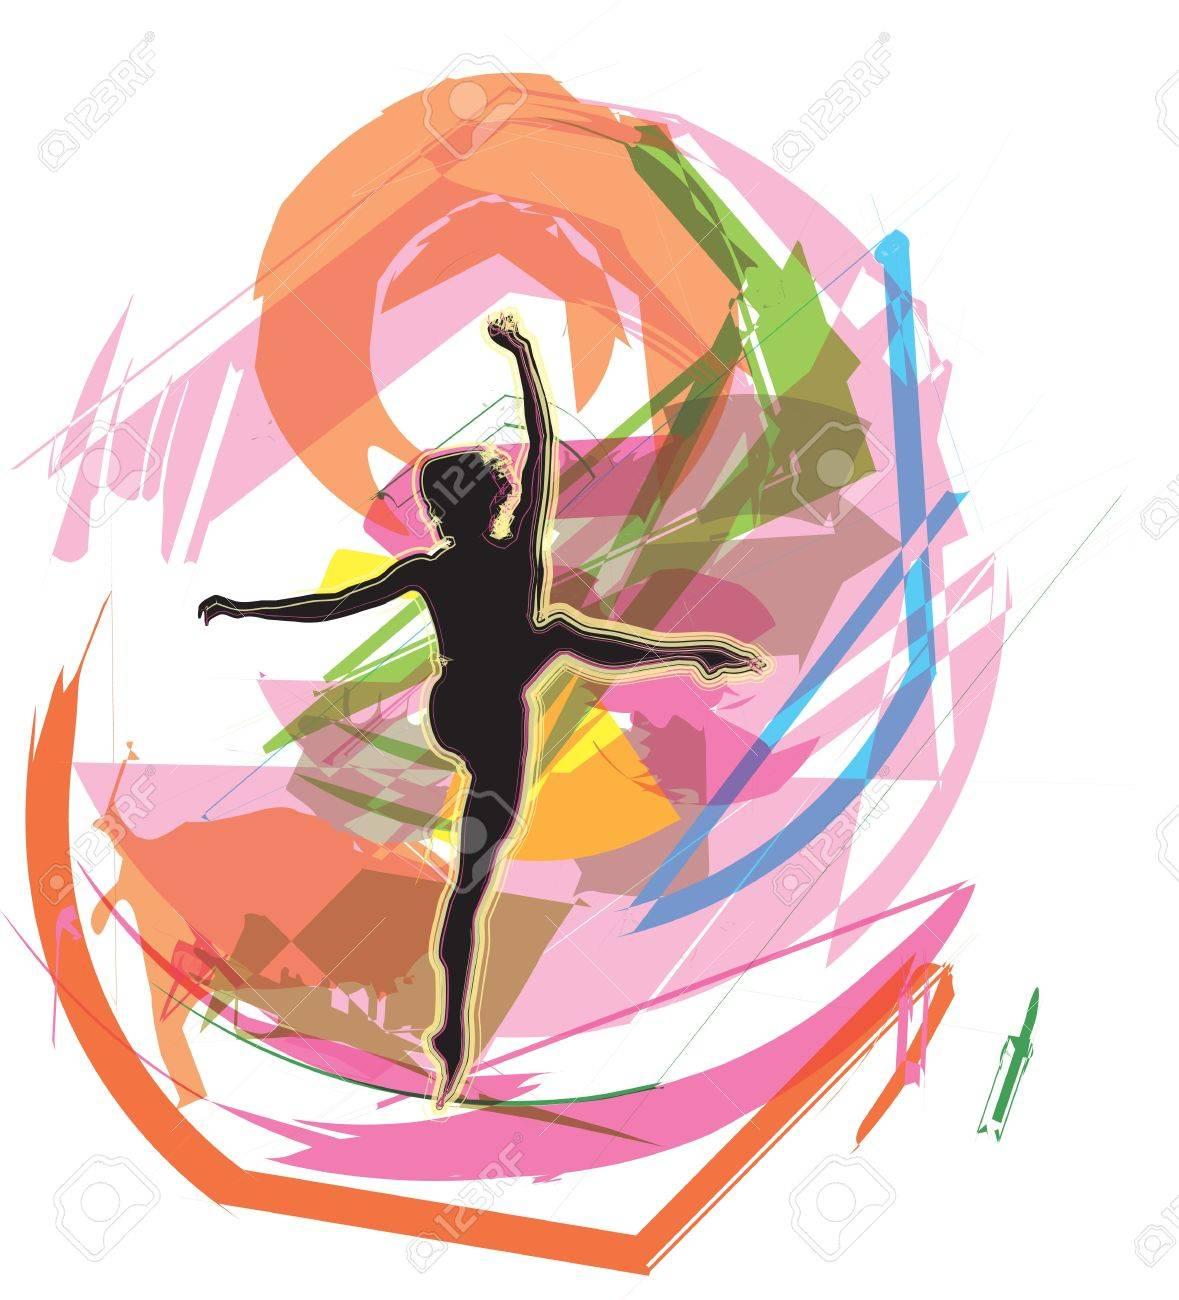 Dancing illustration Stock Vector - 10969335